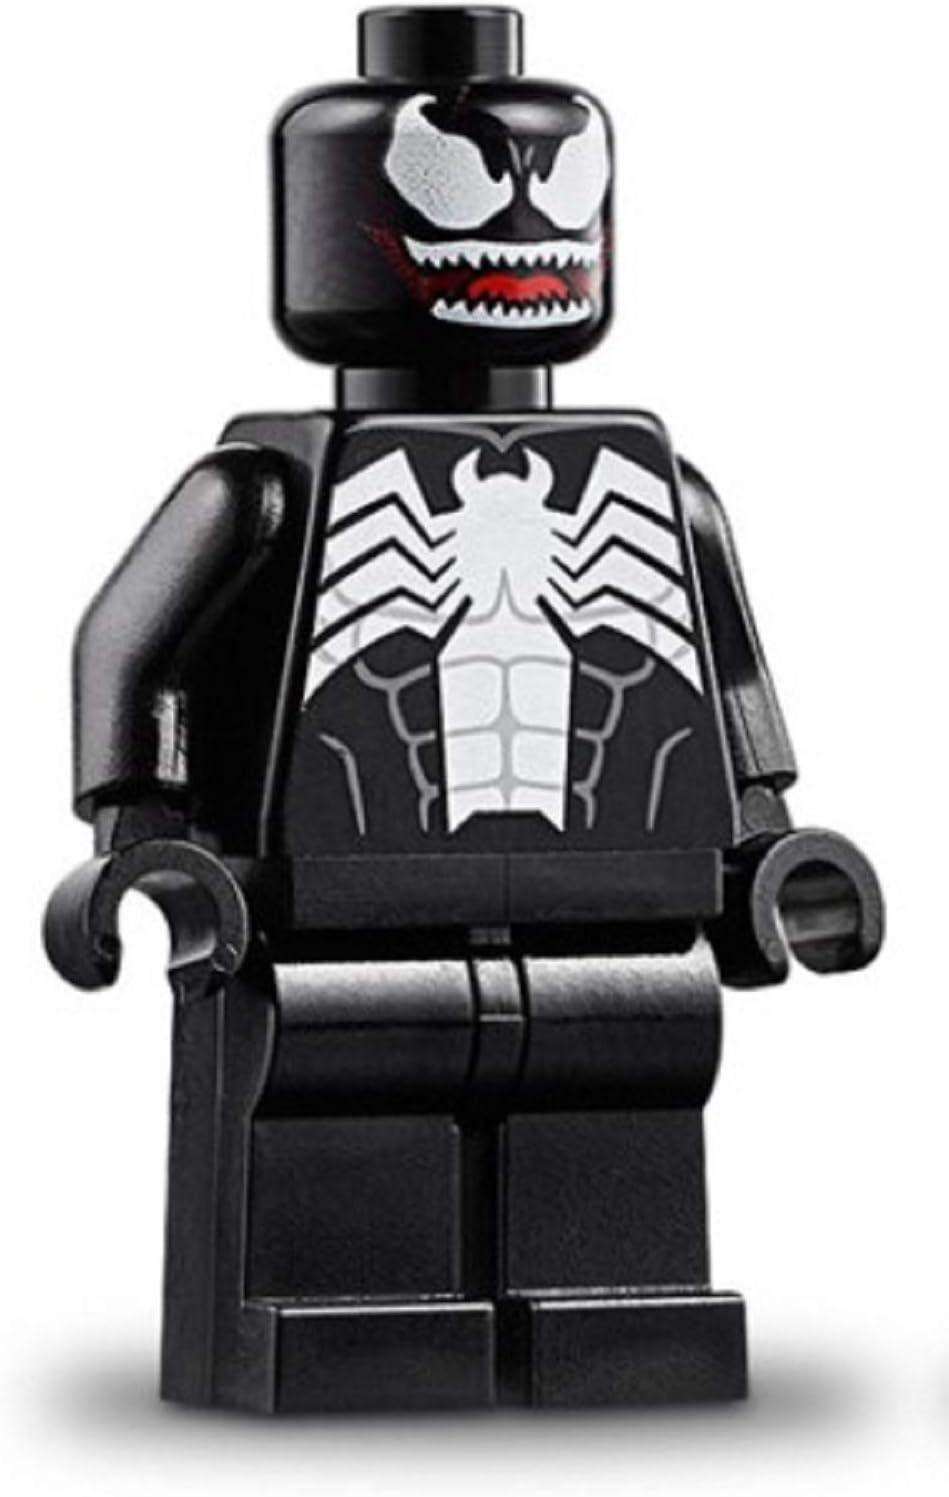 LEGO Superheroes - Venom minifig from Spiderman - 2019